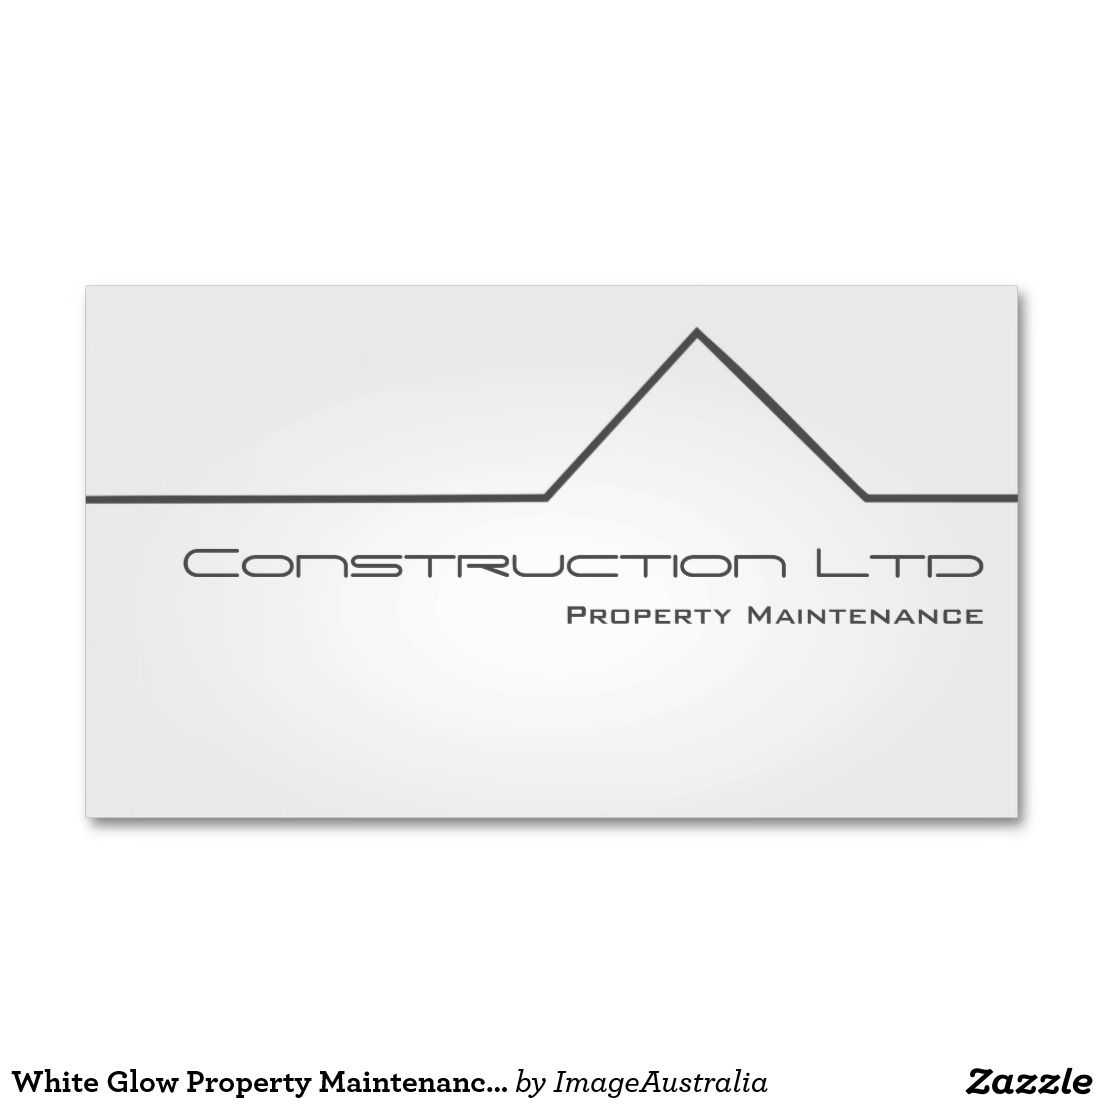 White Glow Property Maintenance Business Card   Pinterest   Business ...